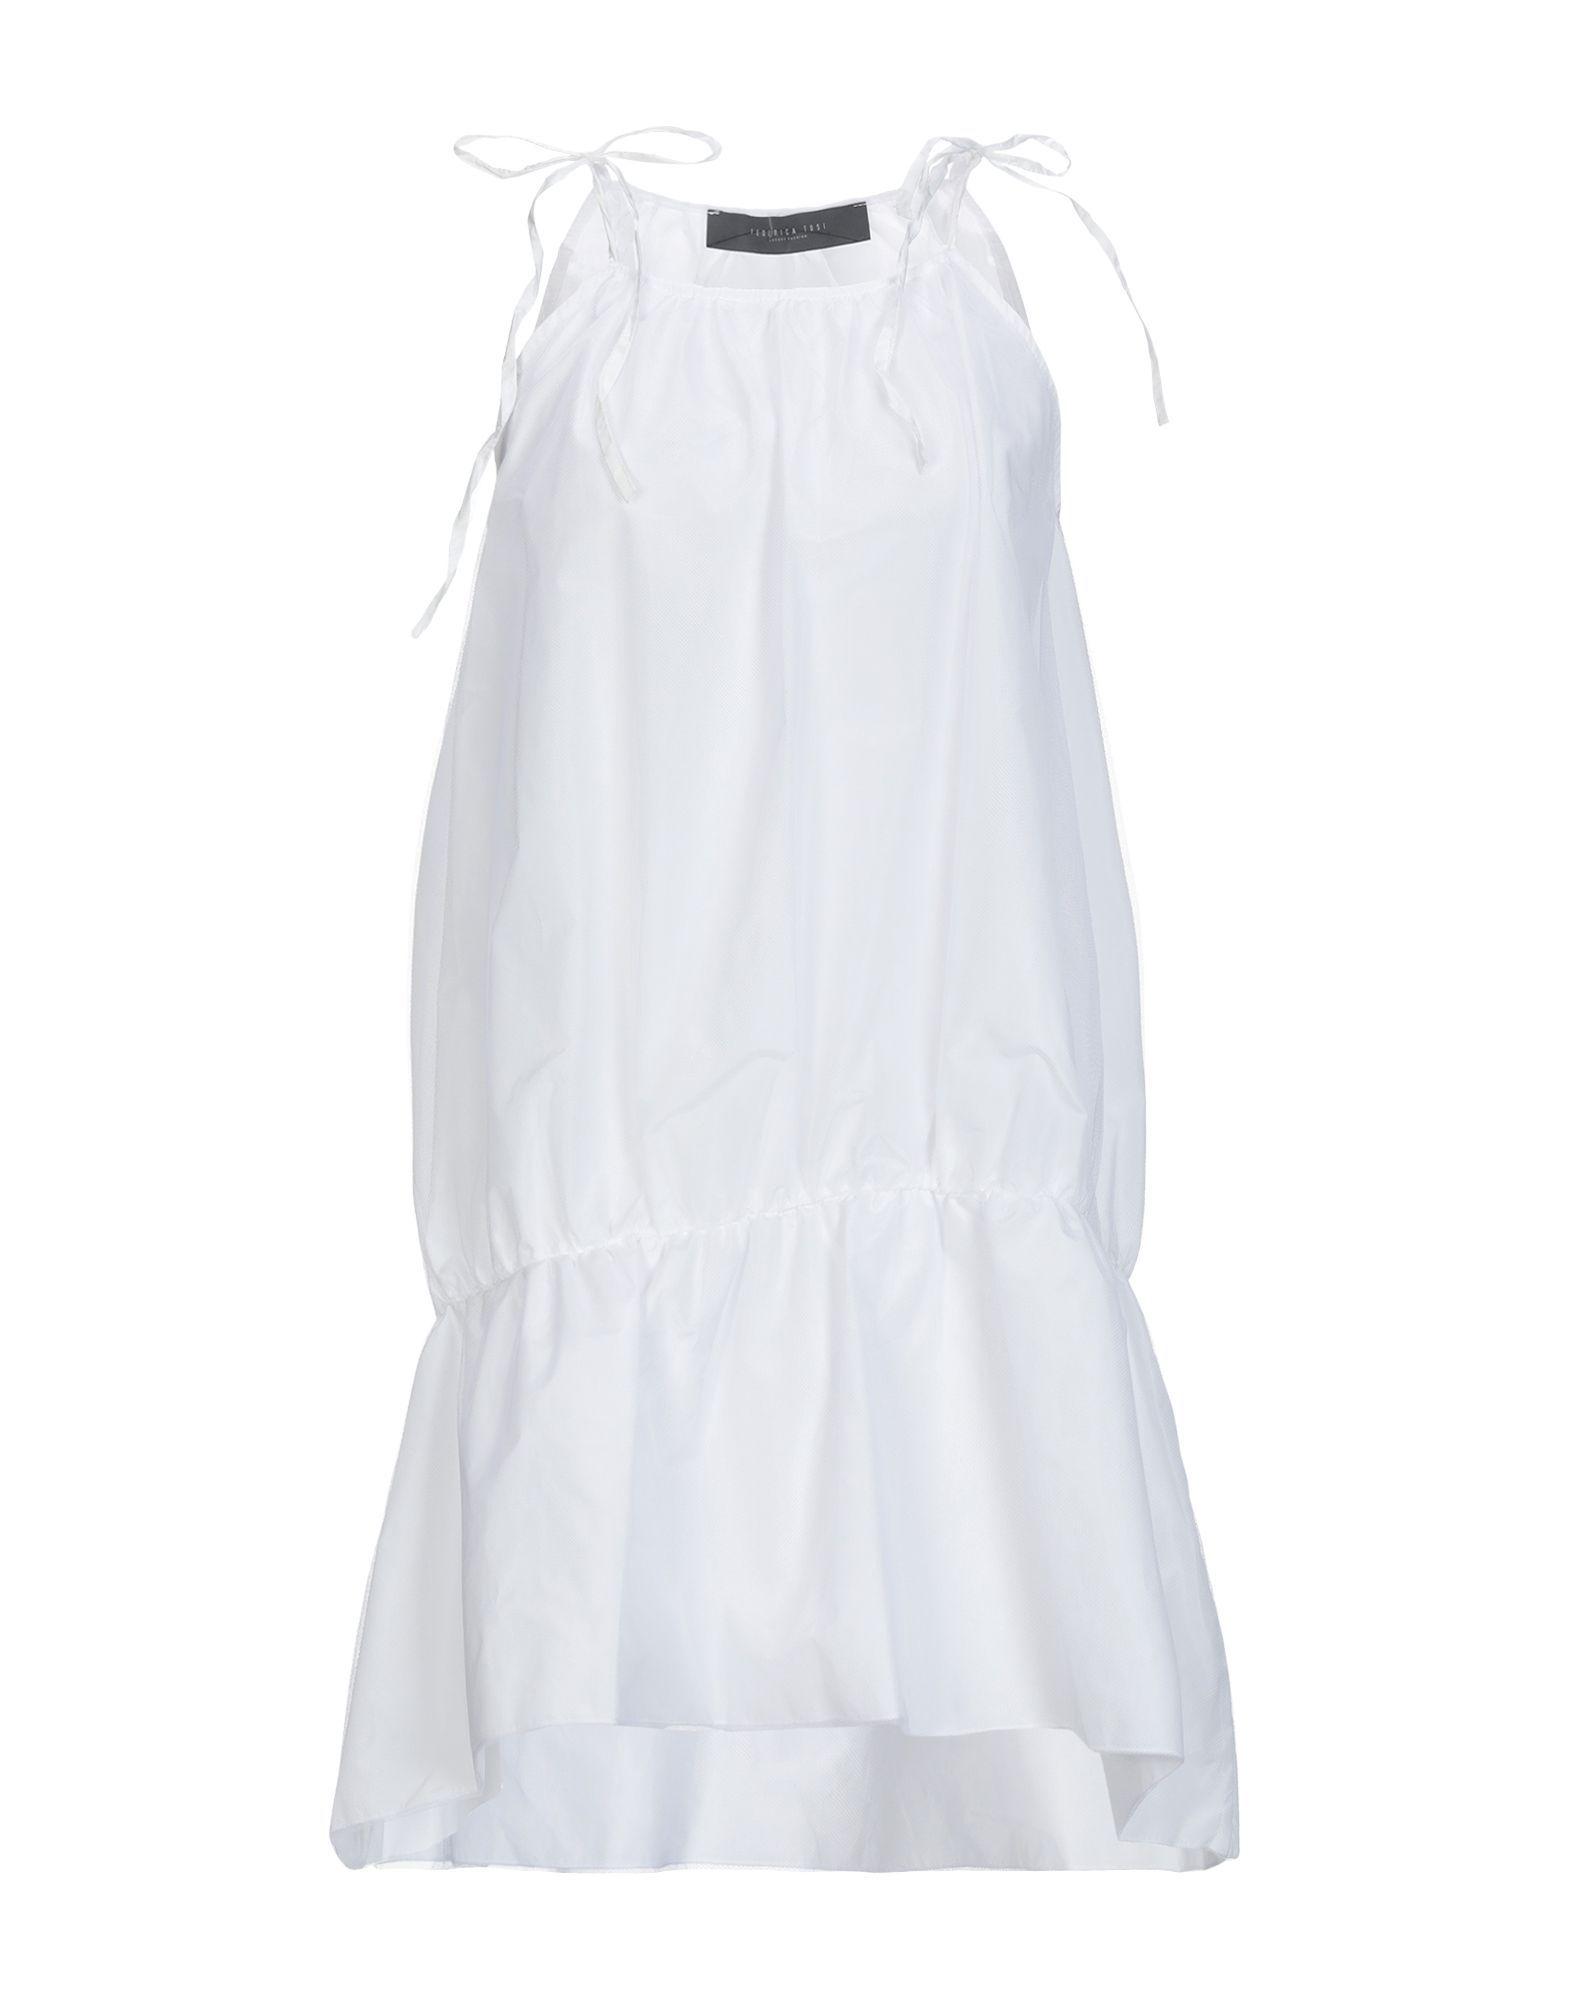 Federica Tosi White Short Dress